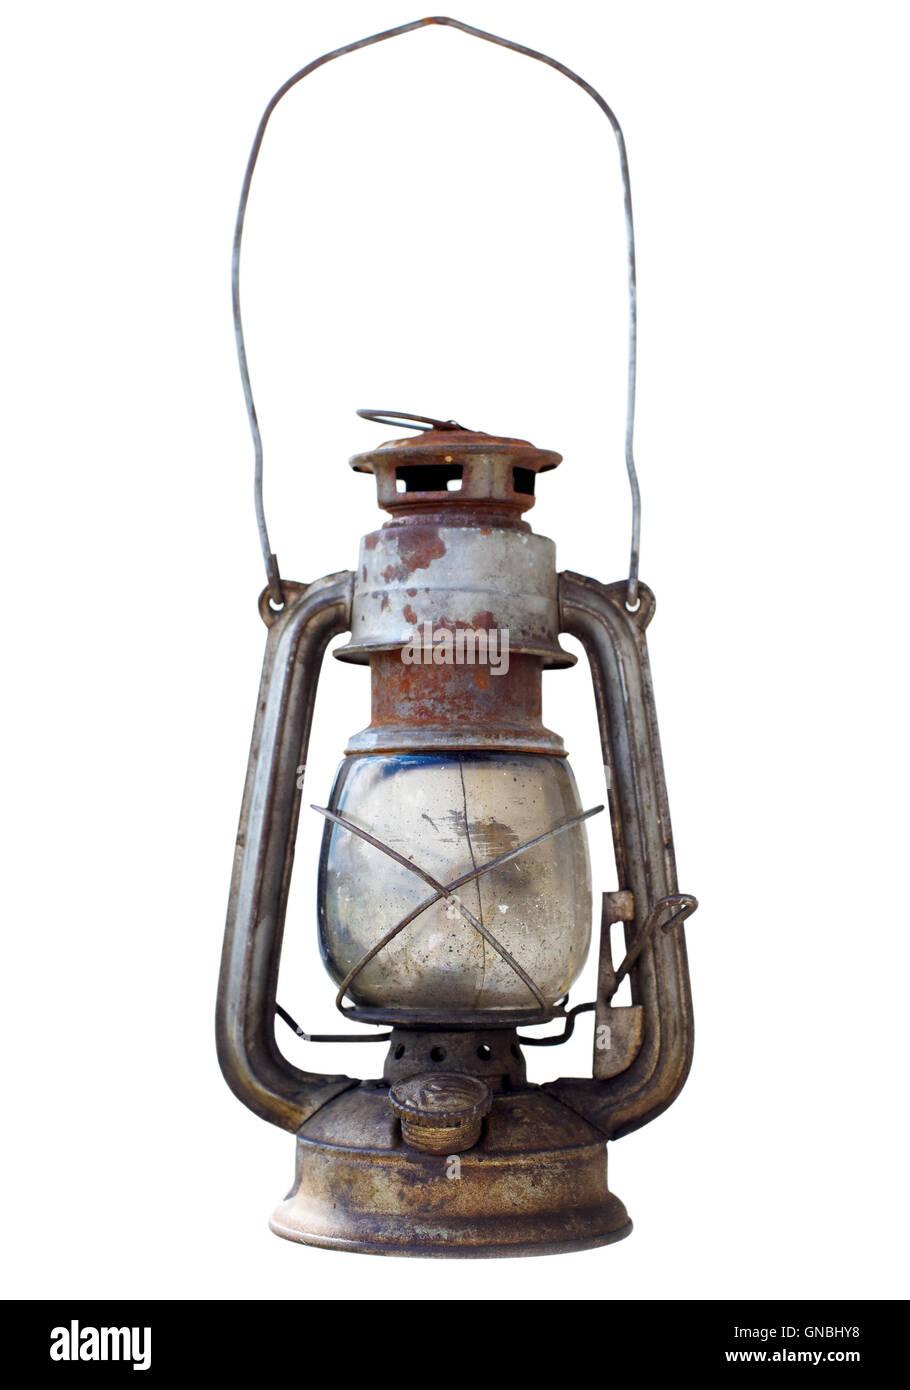 Old kerosene lantern - Stock Image